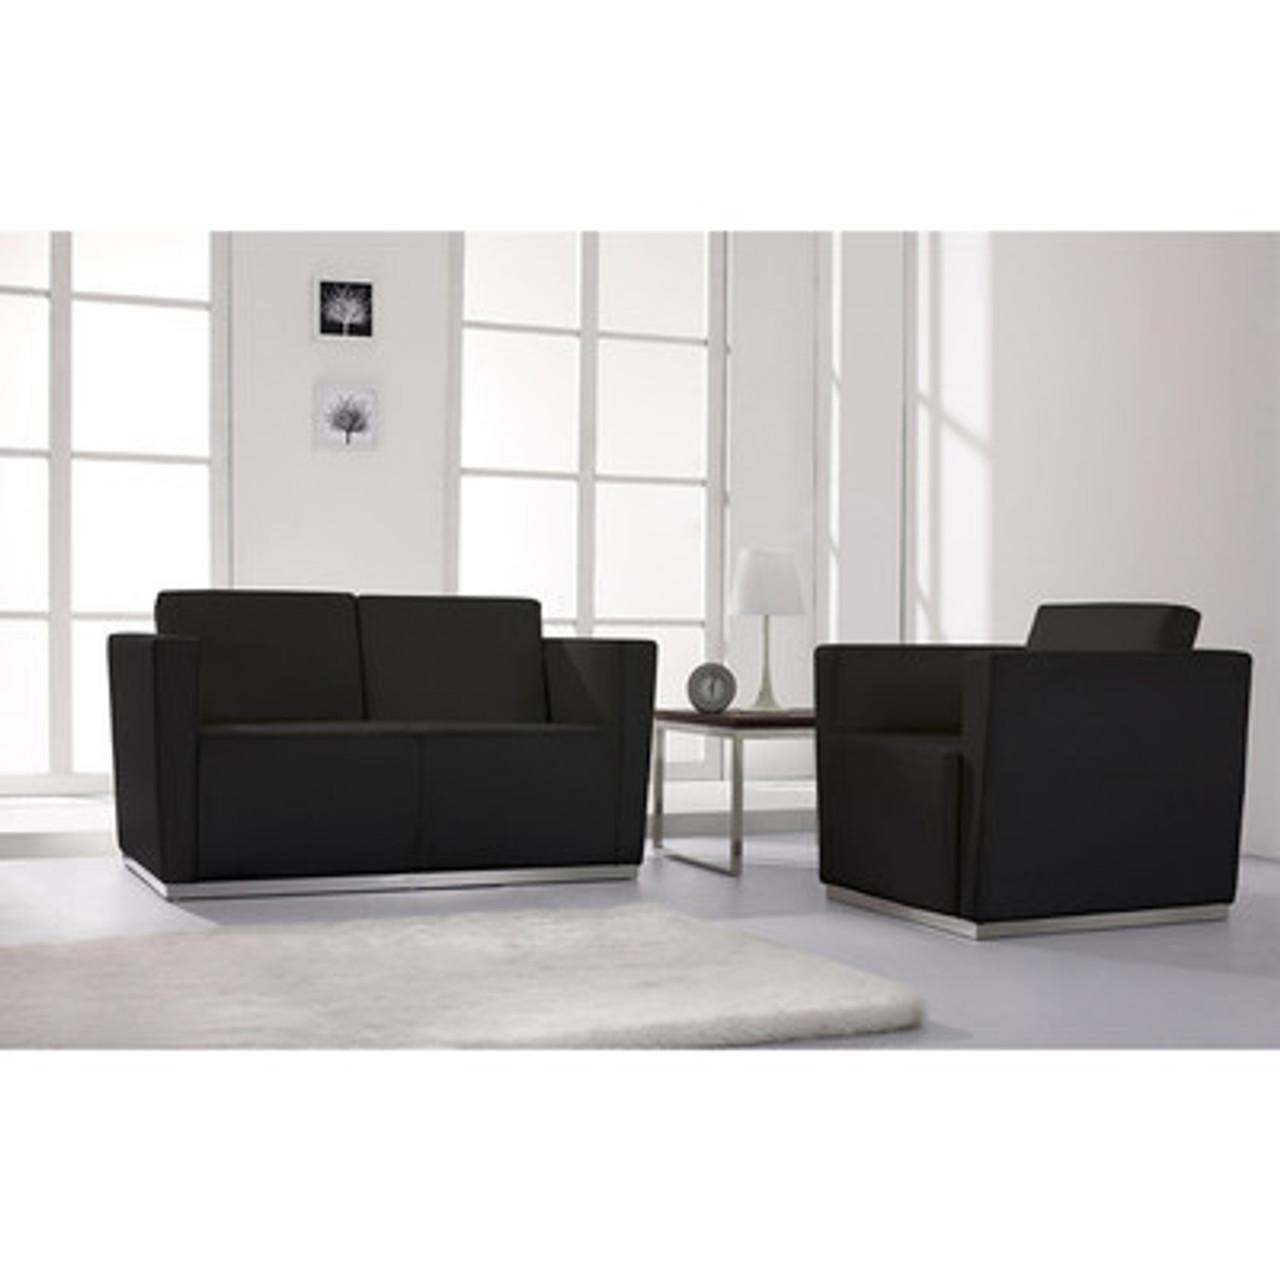 2pc Modern Leather Office Reception Sofa Set, FF-0456-12-S2